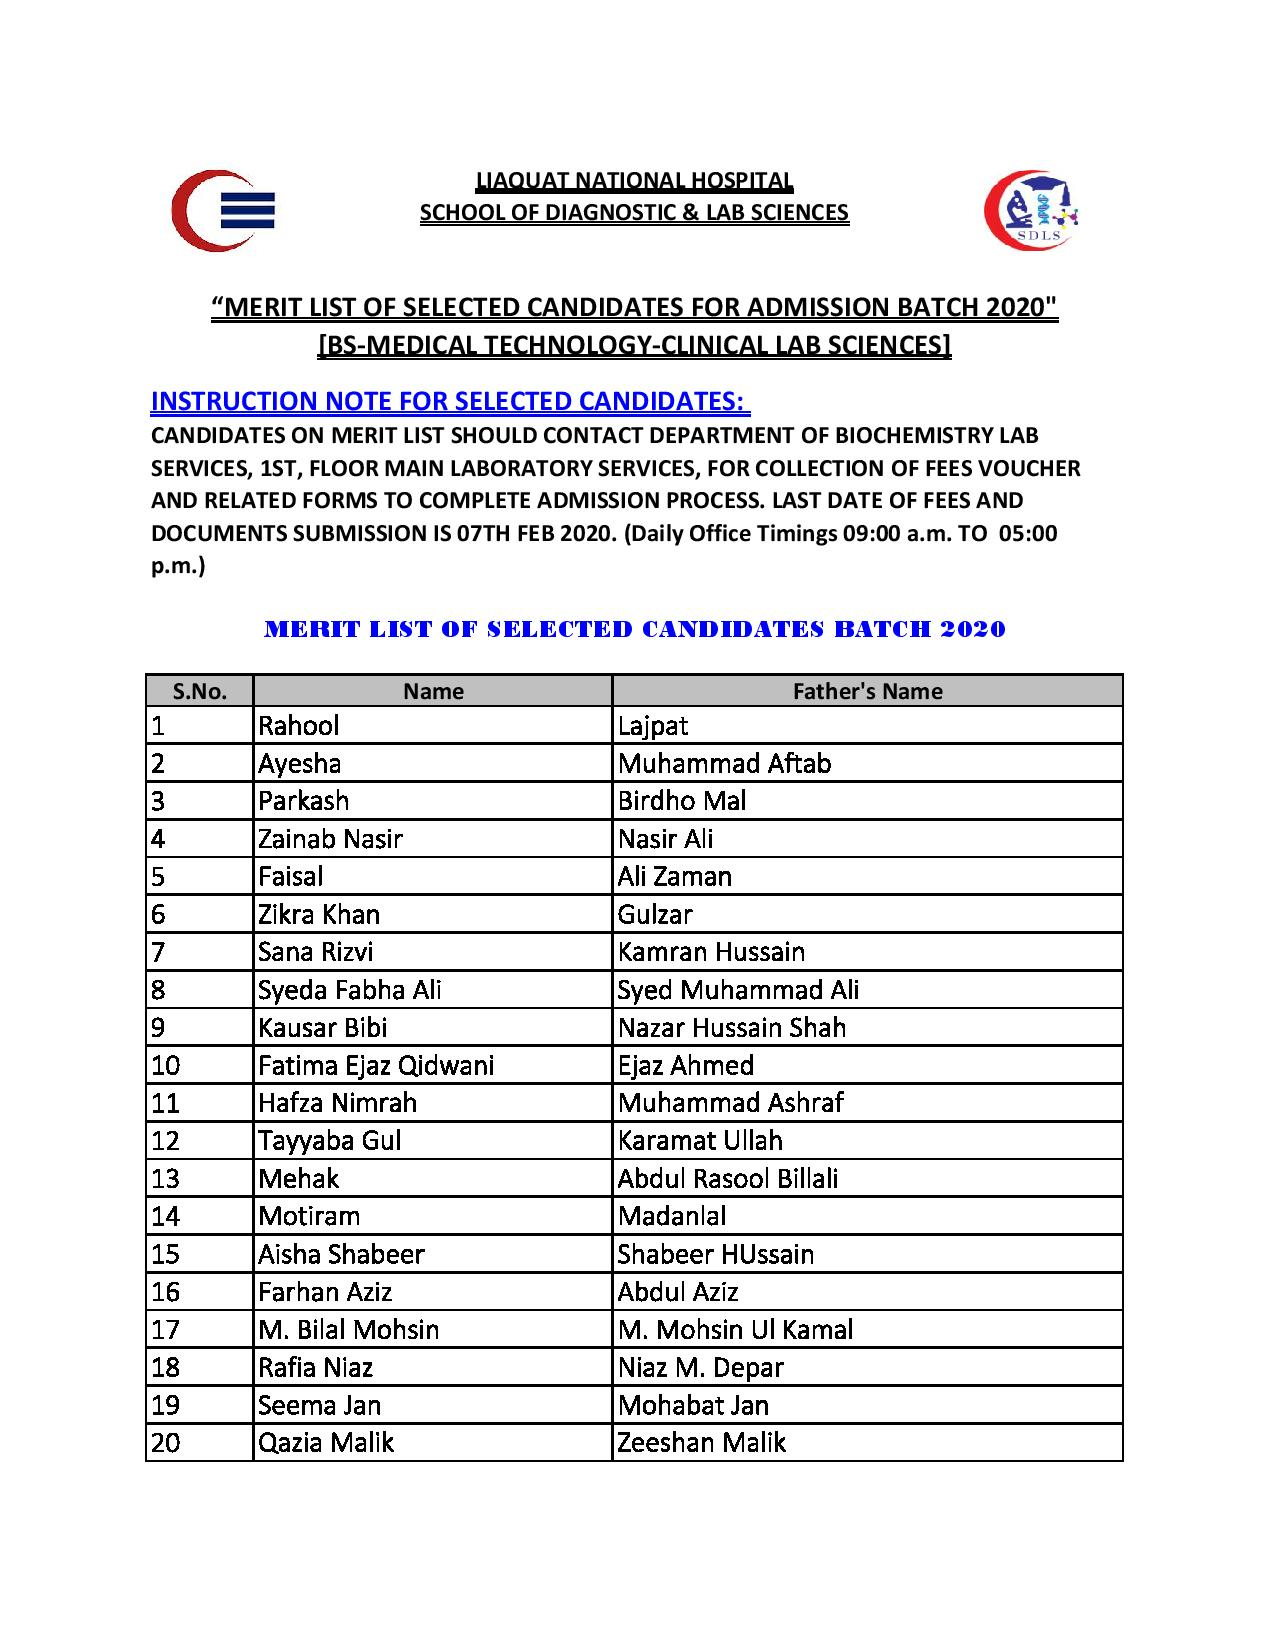 Merit List of Selected Students BS MT CLS-SDLS Batch 2020